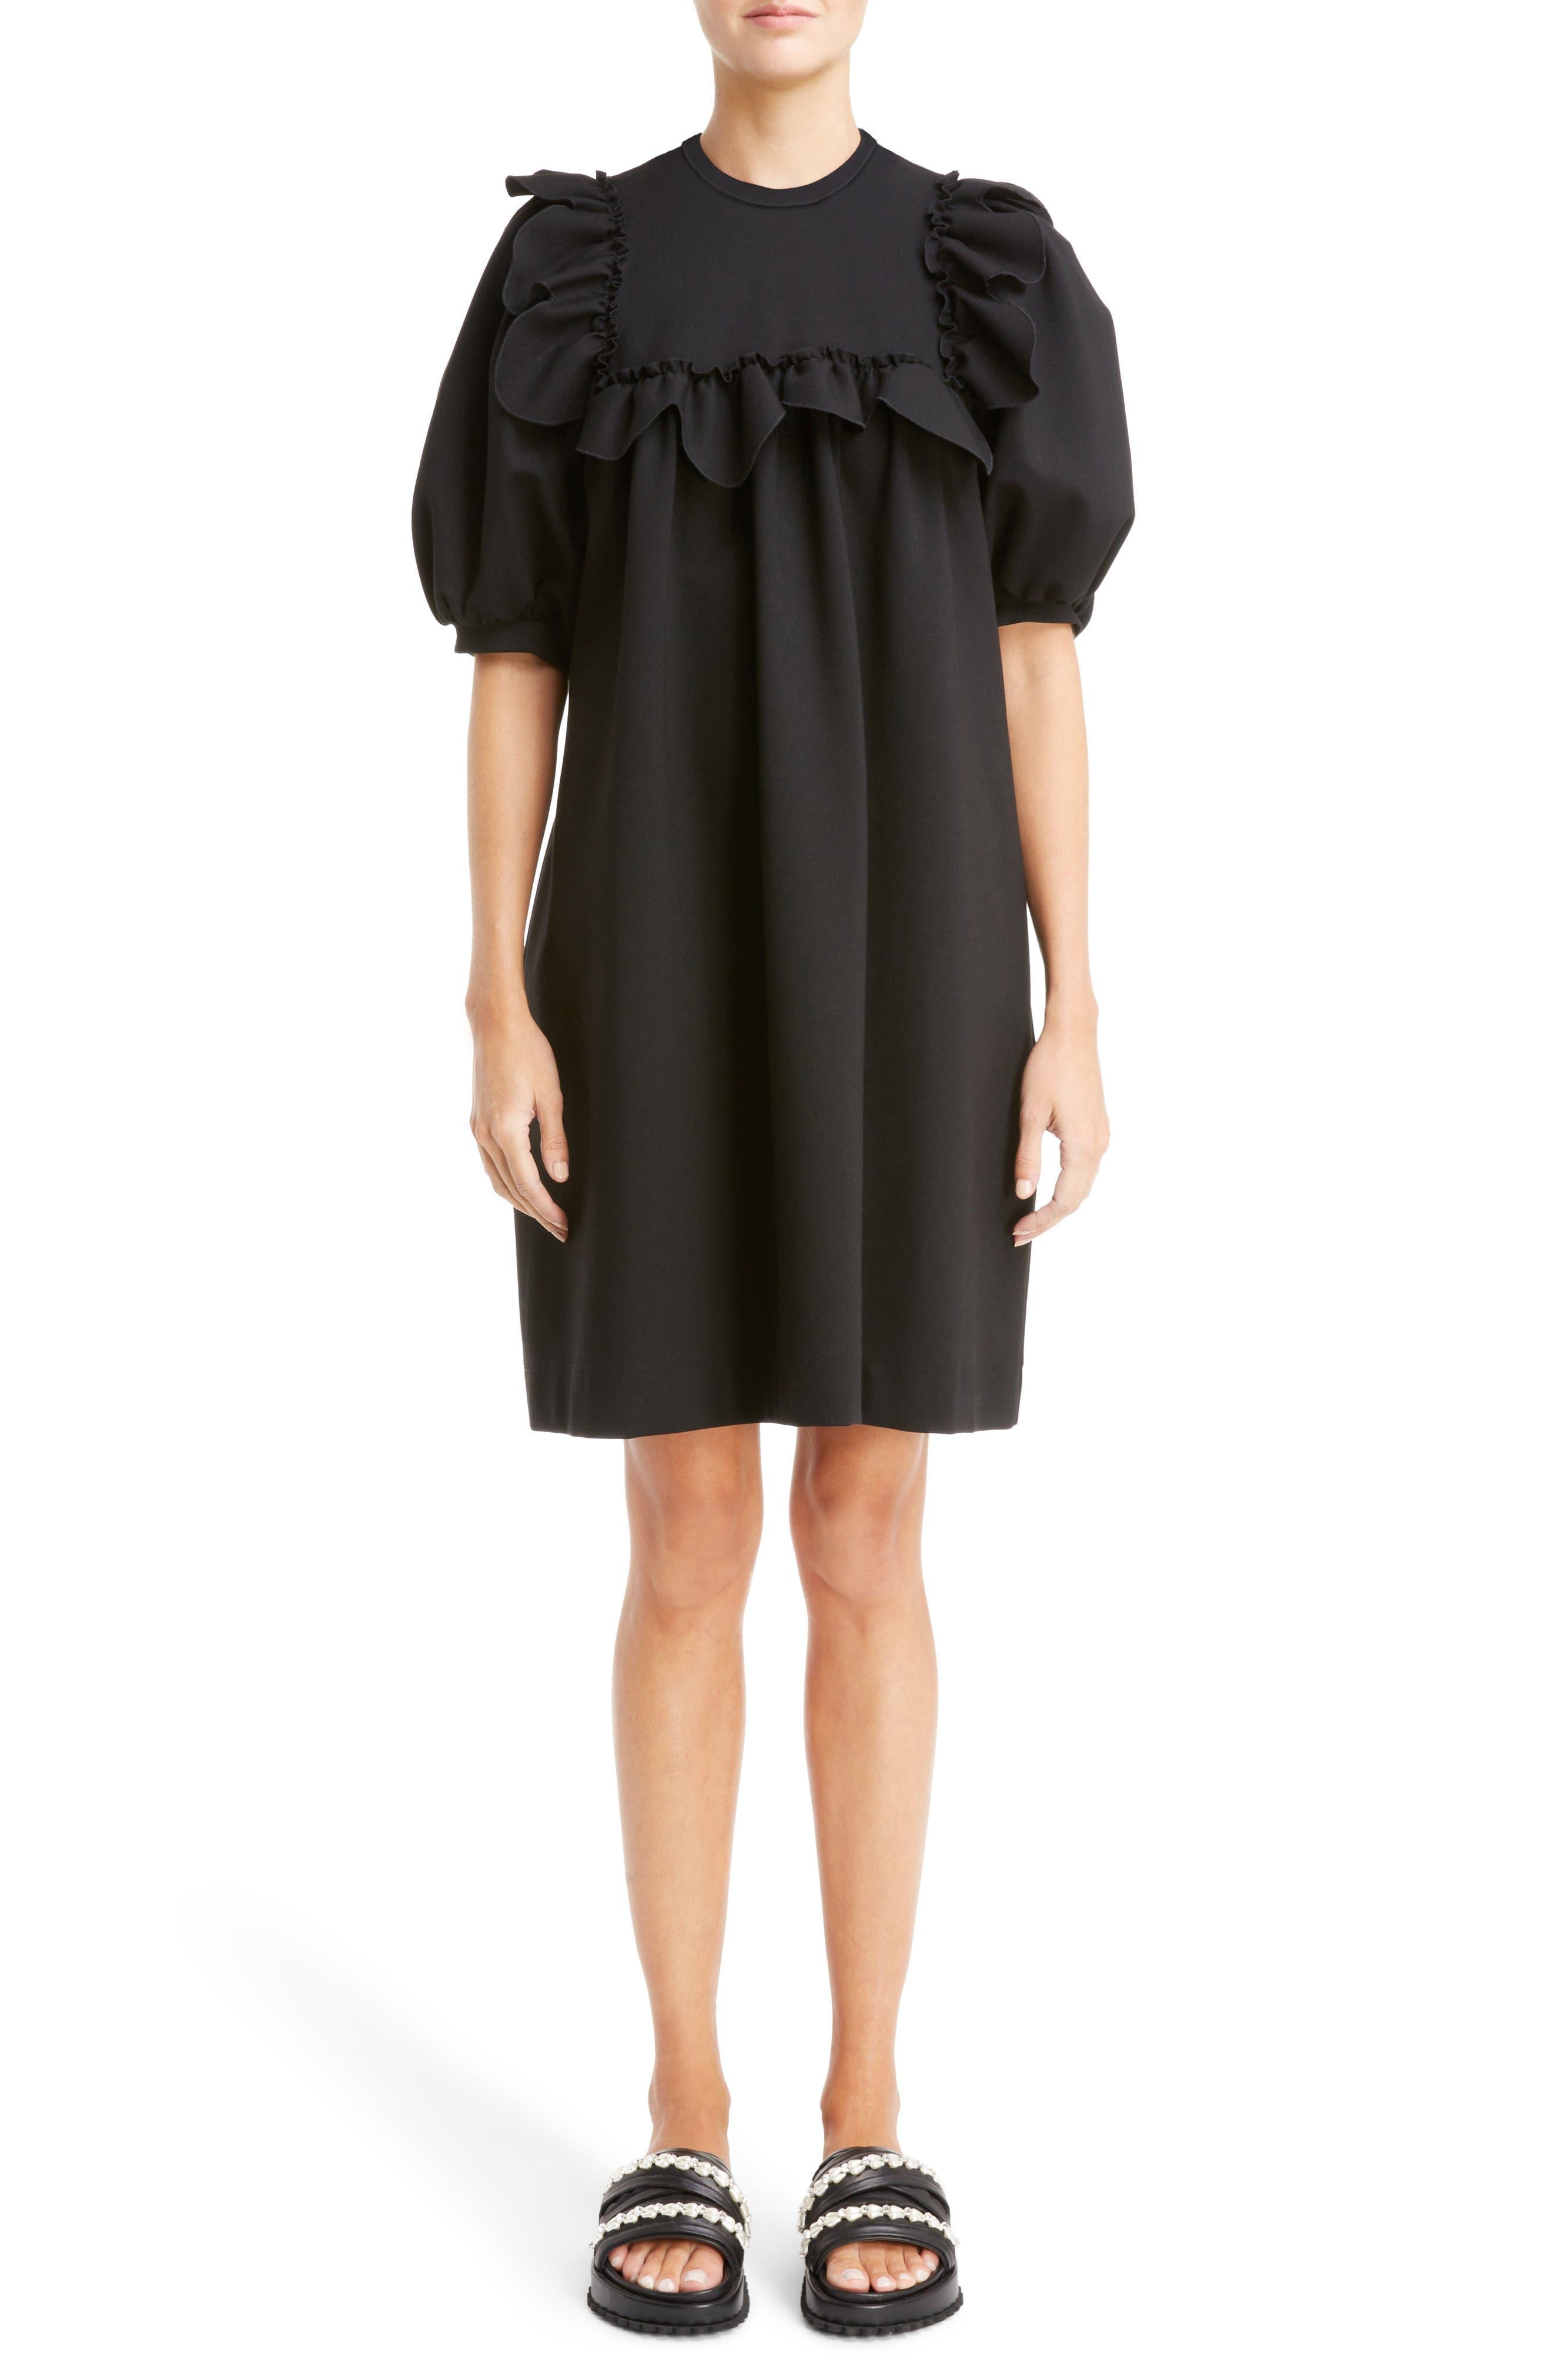 Simone Rocha Ruffle Bib Dress